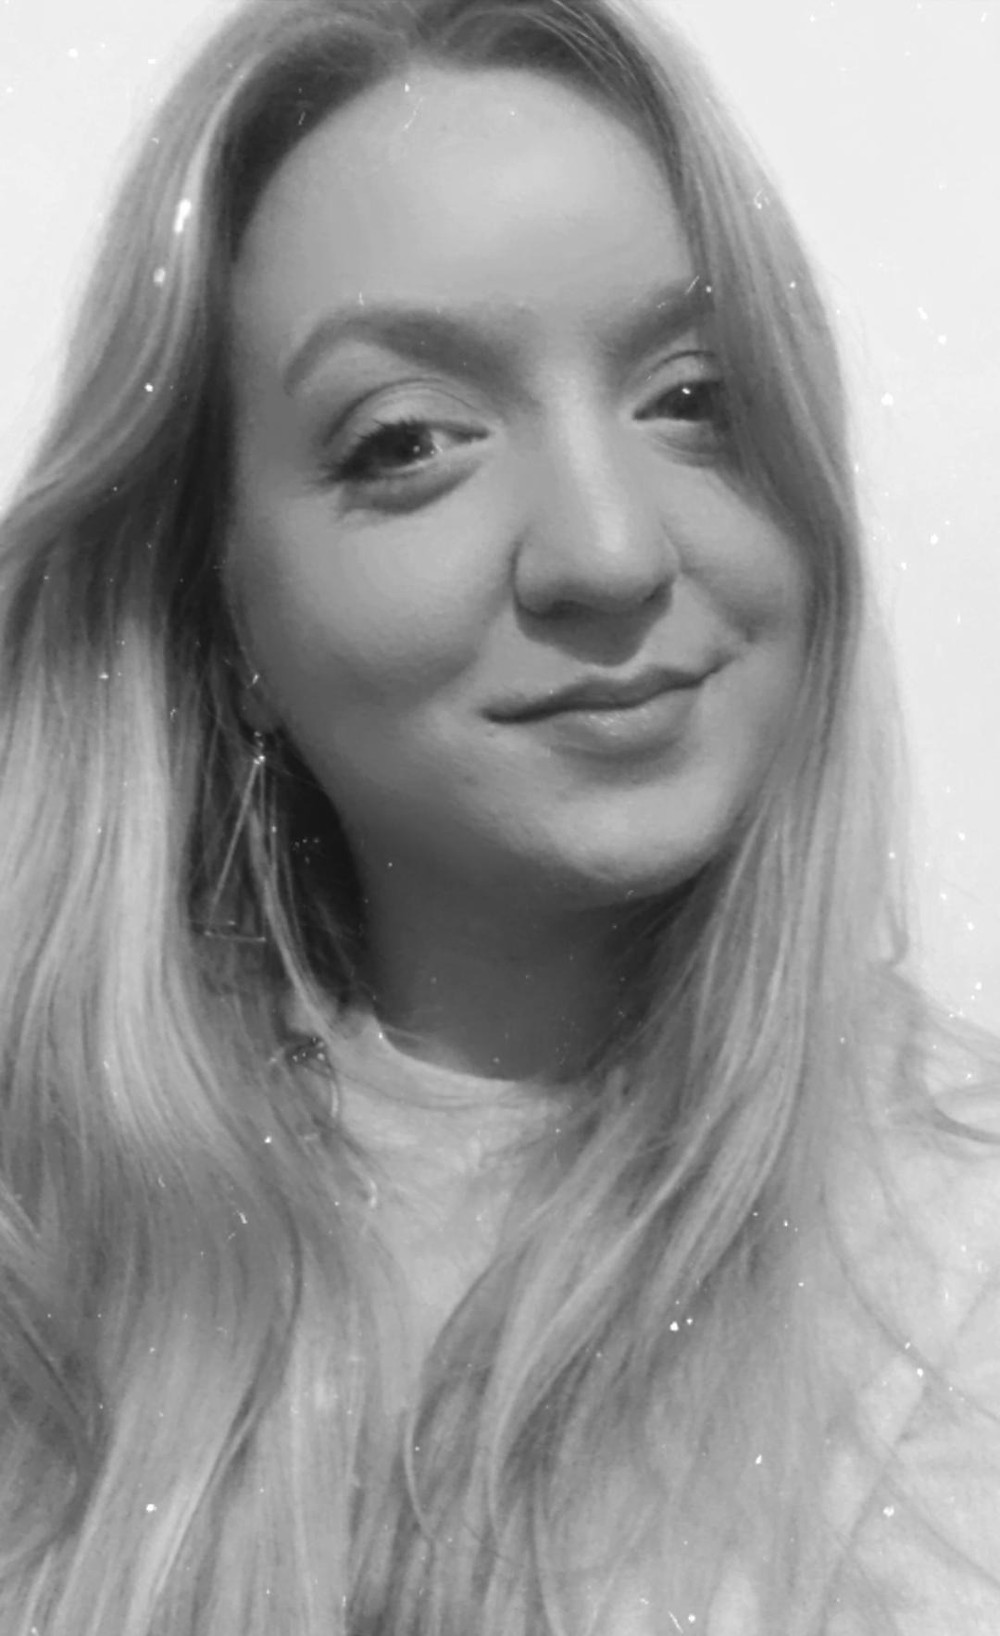 selfie hannah instagram filter